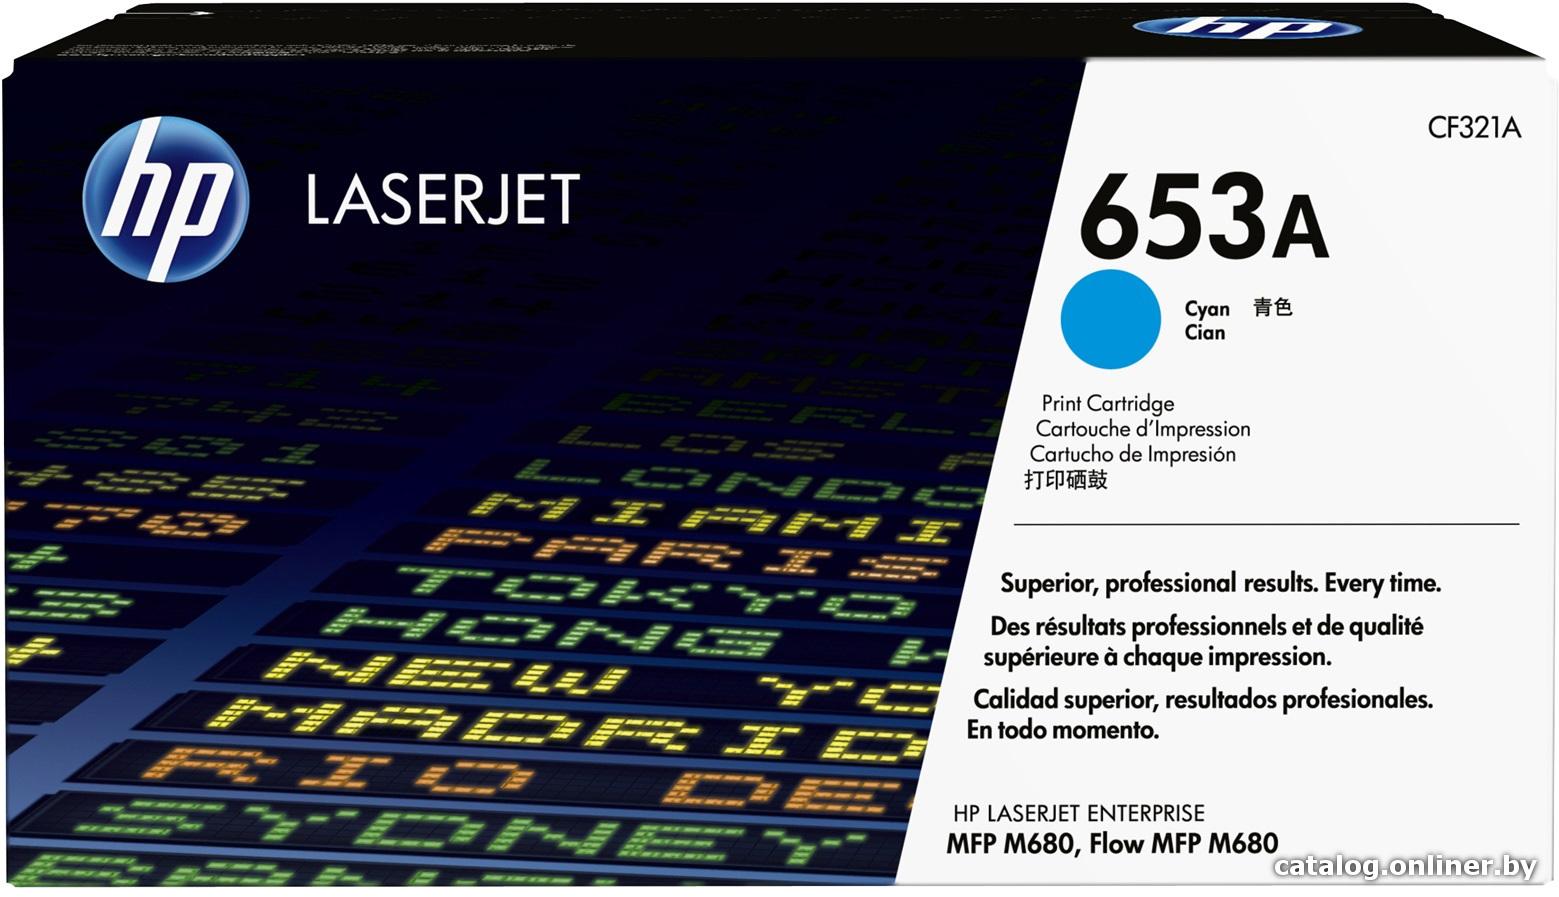 Картридж HP CF321A (№653A) Cyan для LaserJet Enterprise MFP M680, Flow MFP M680, PRO MFP 675